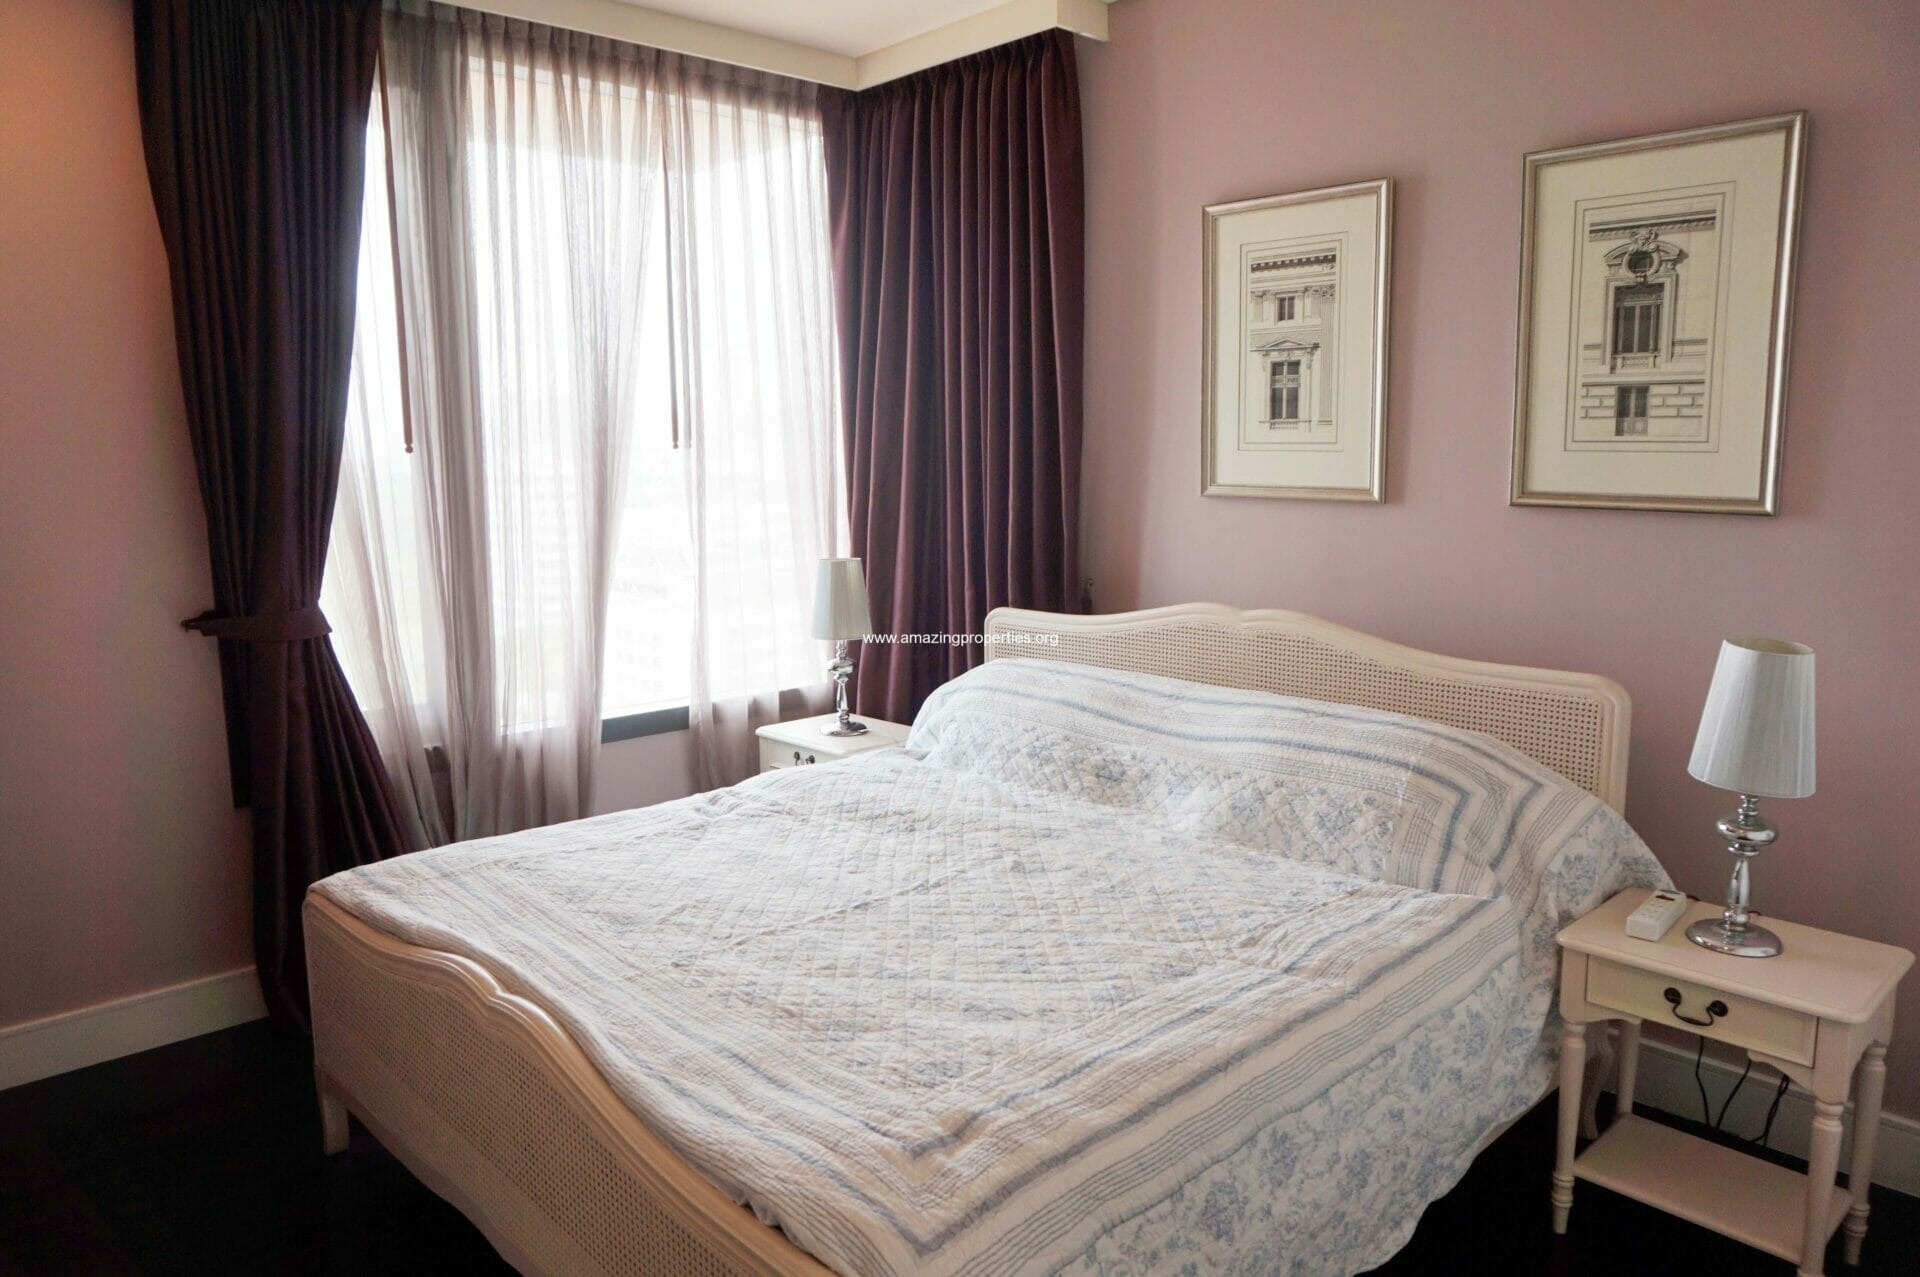 2 Bedroom Condo Aguston Sukhumvit 22-5